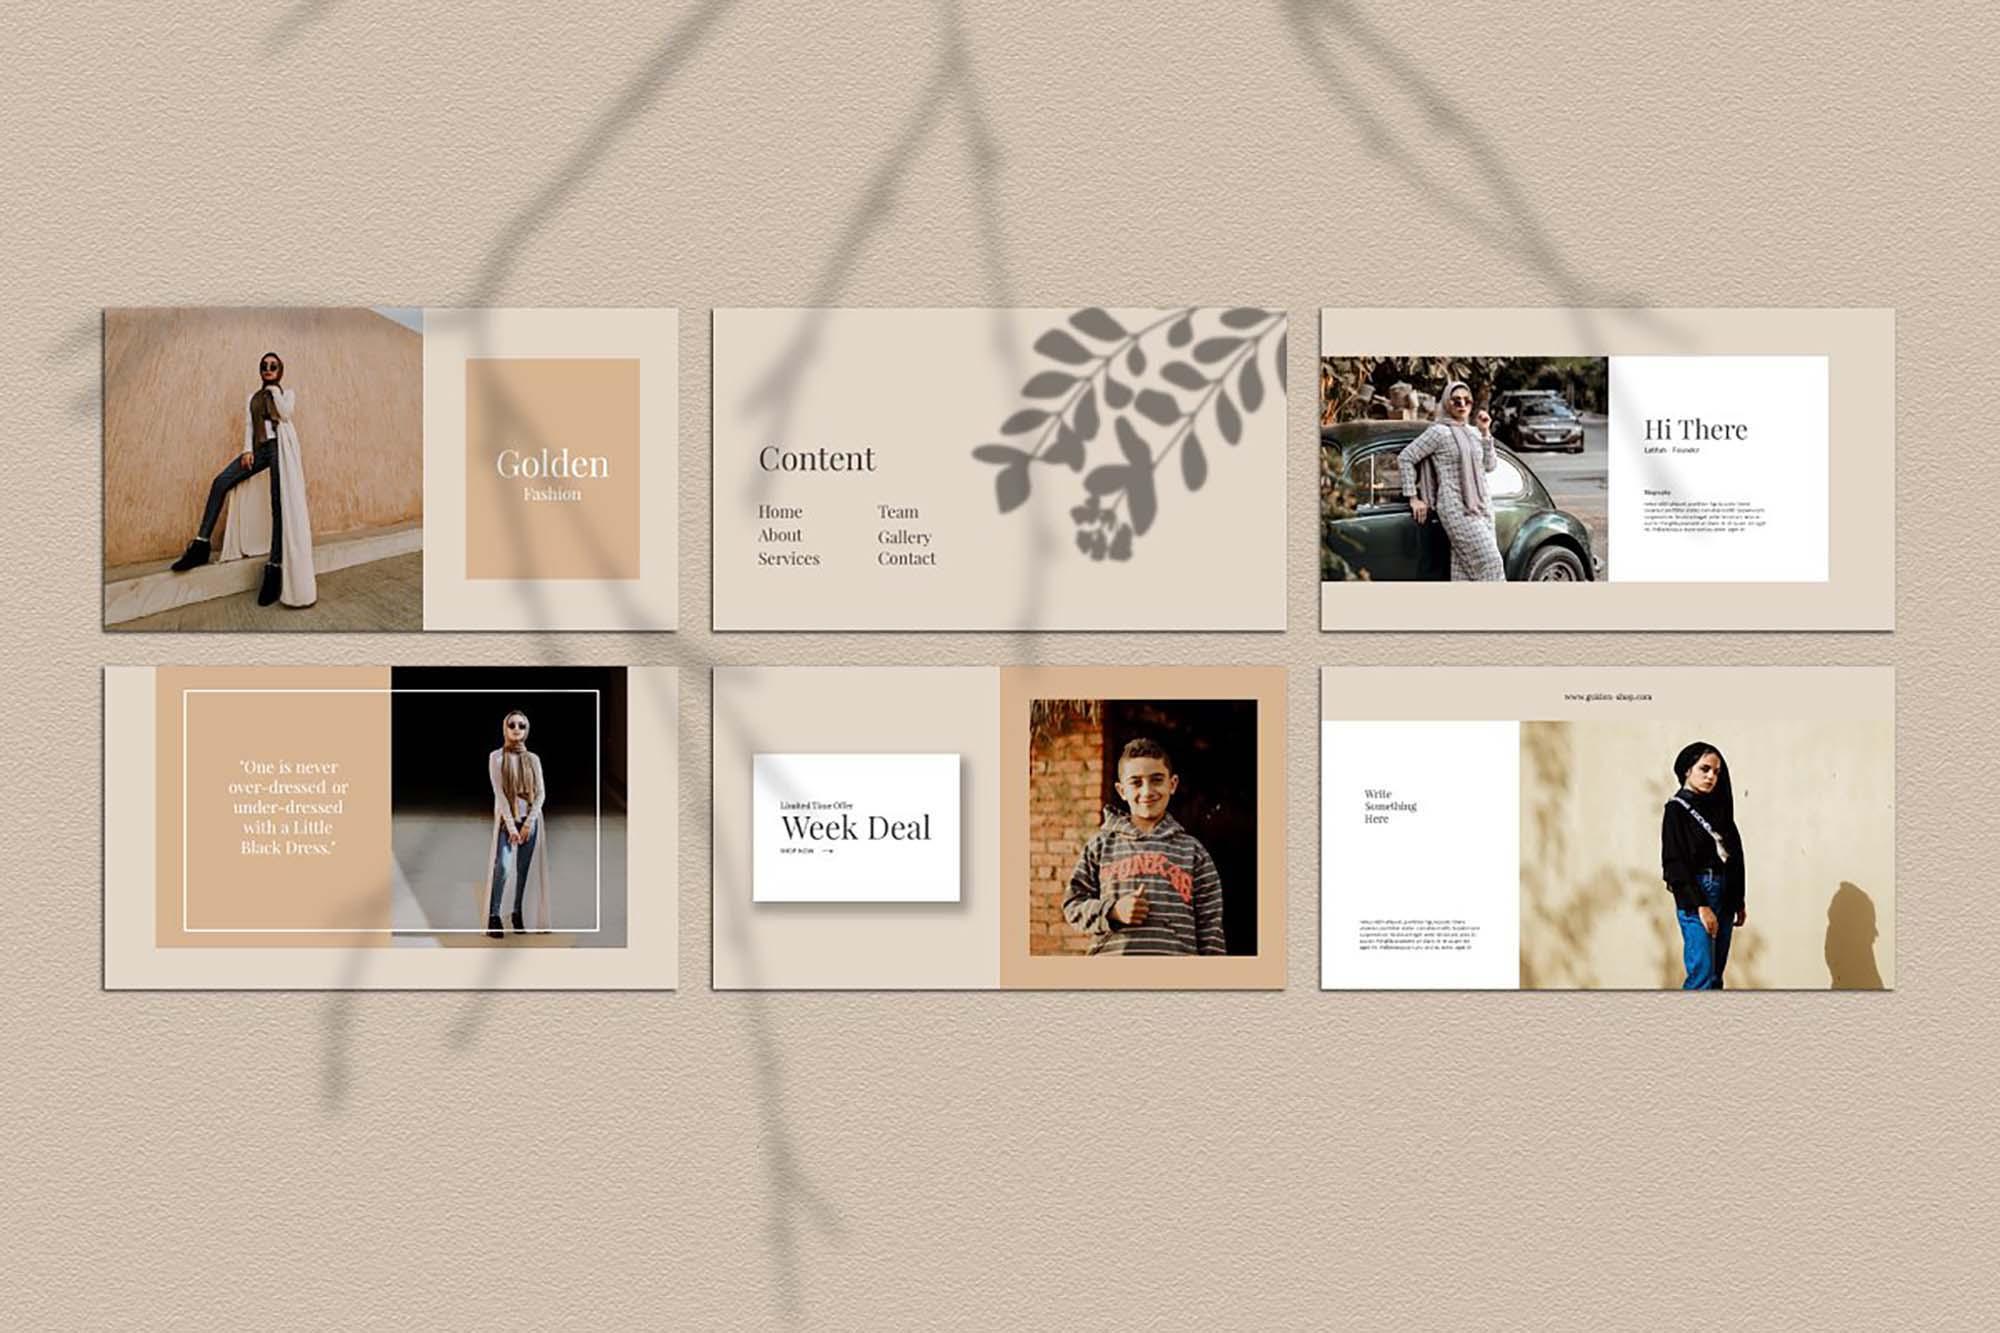 Golden Lookbook Fashion Powerpoint 2